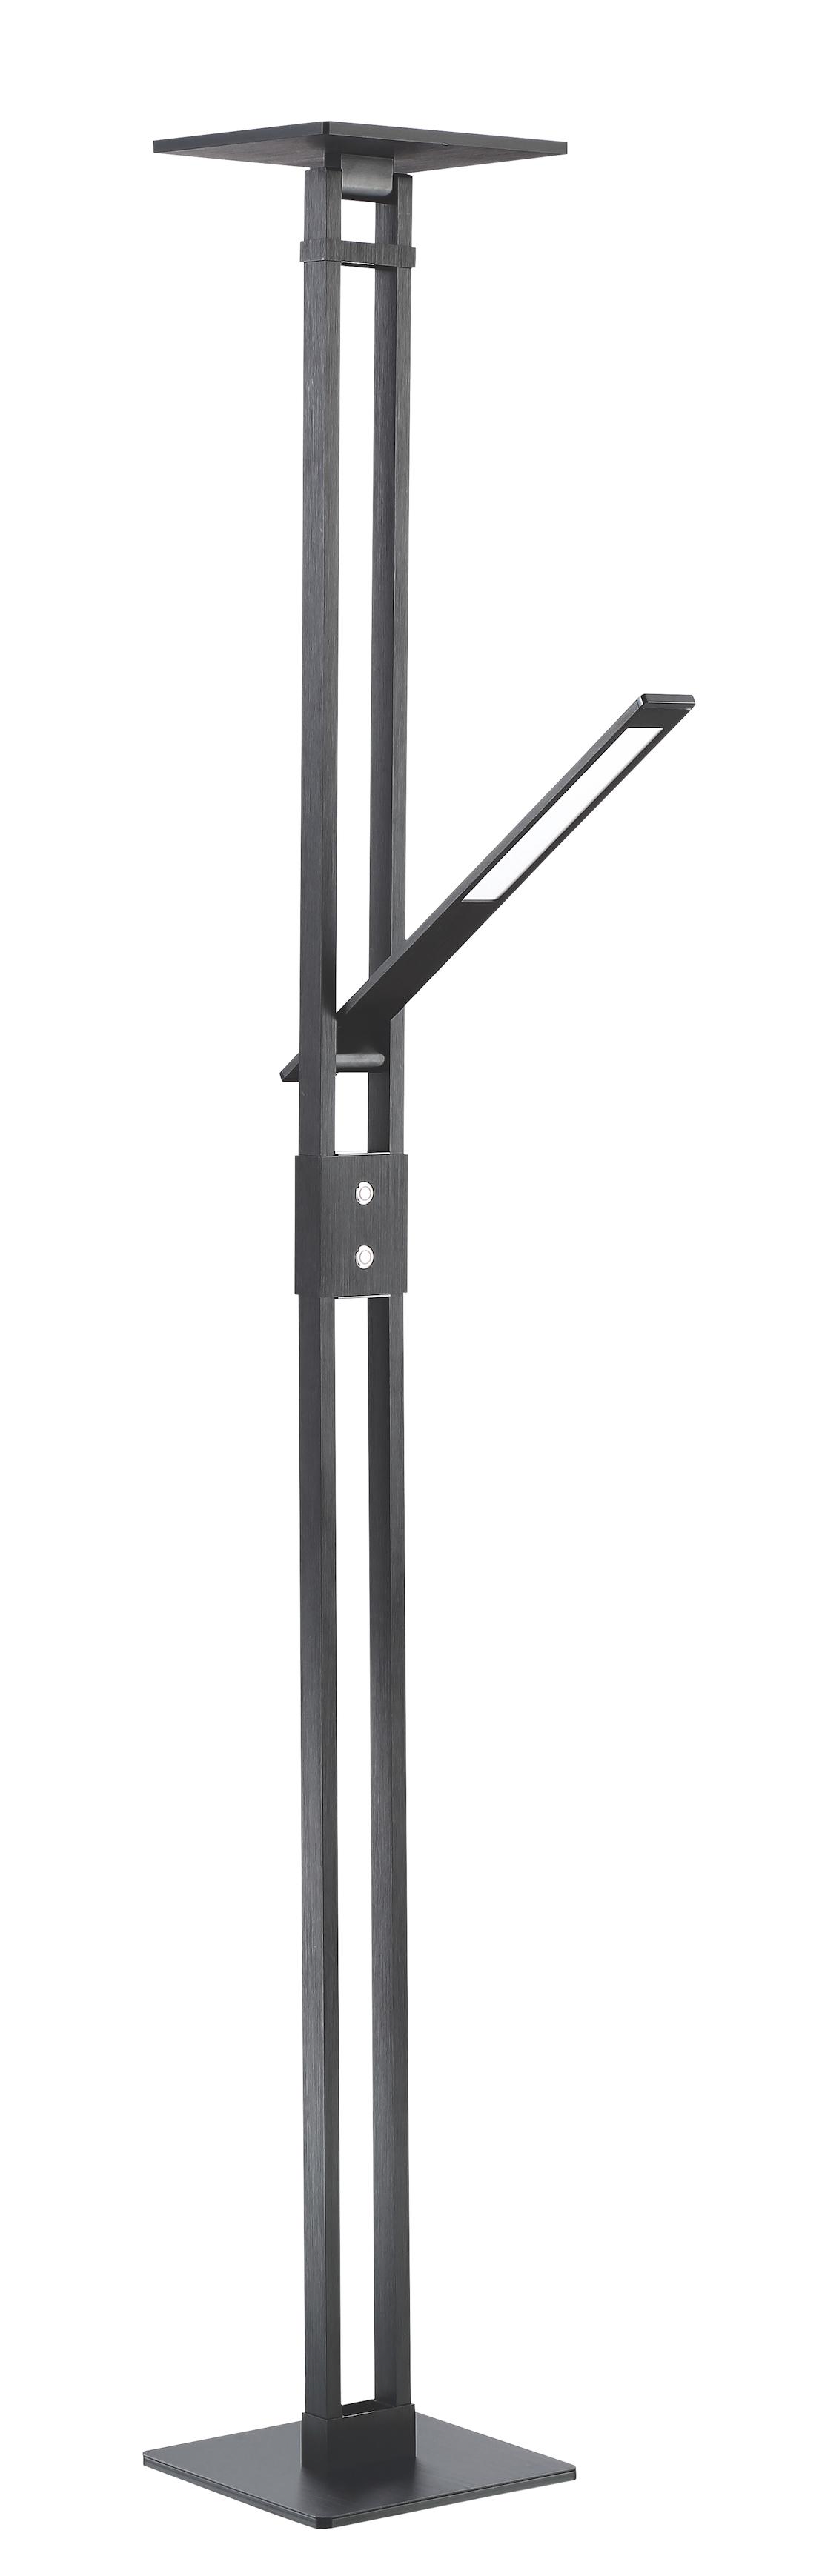 Floor Lamp Modern VARR Kendal TC5001-BLK